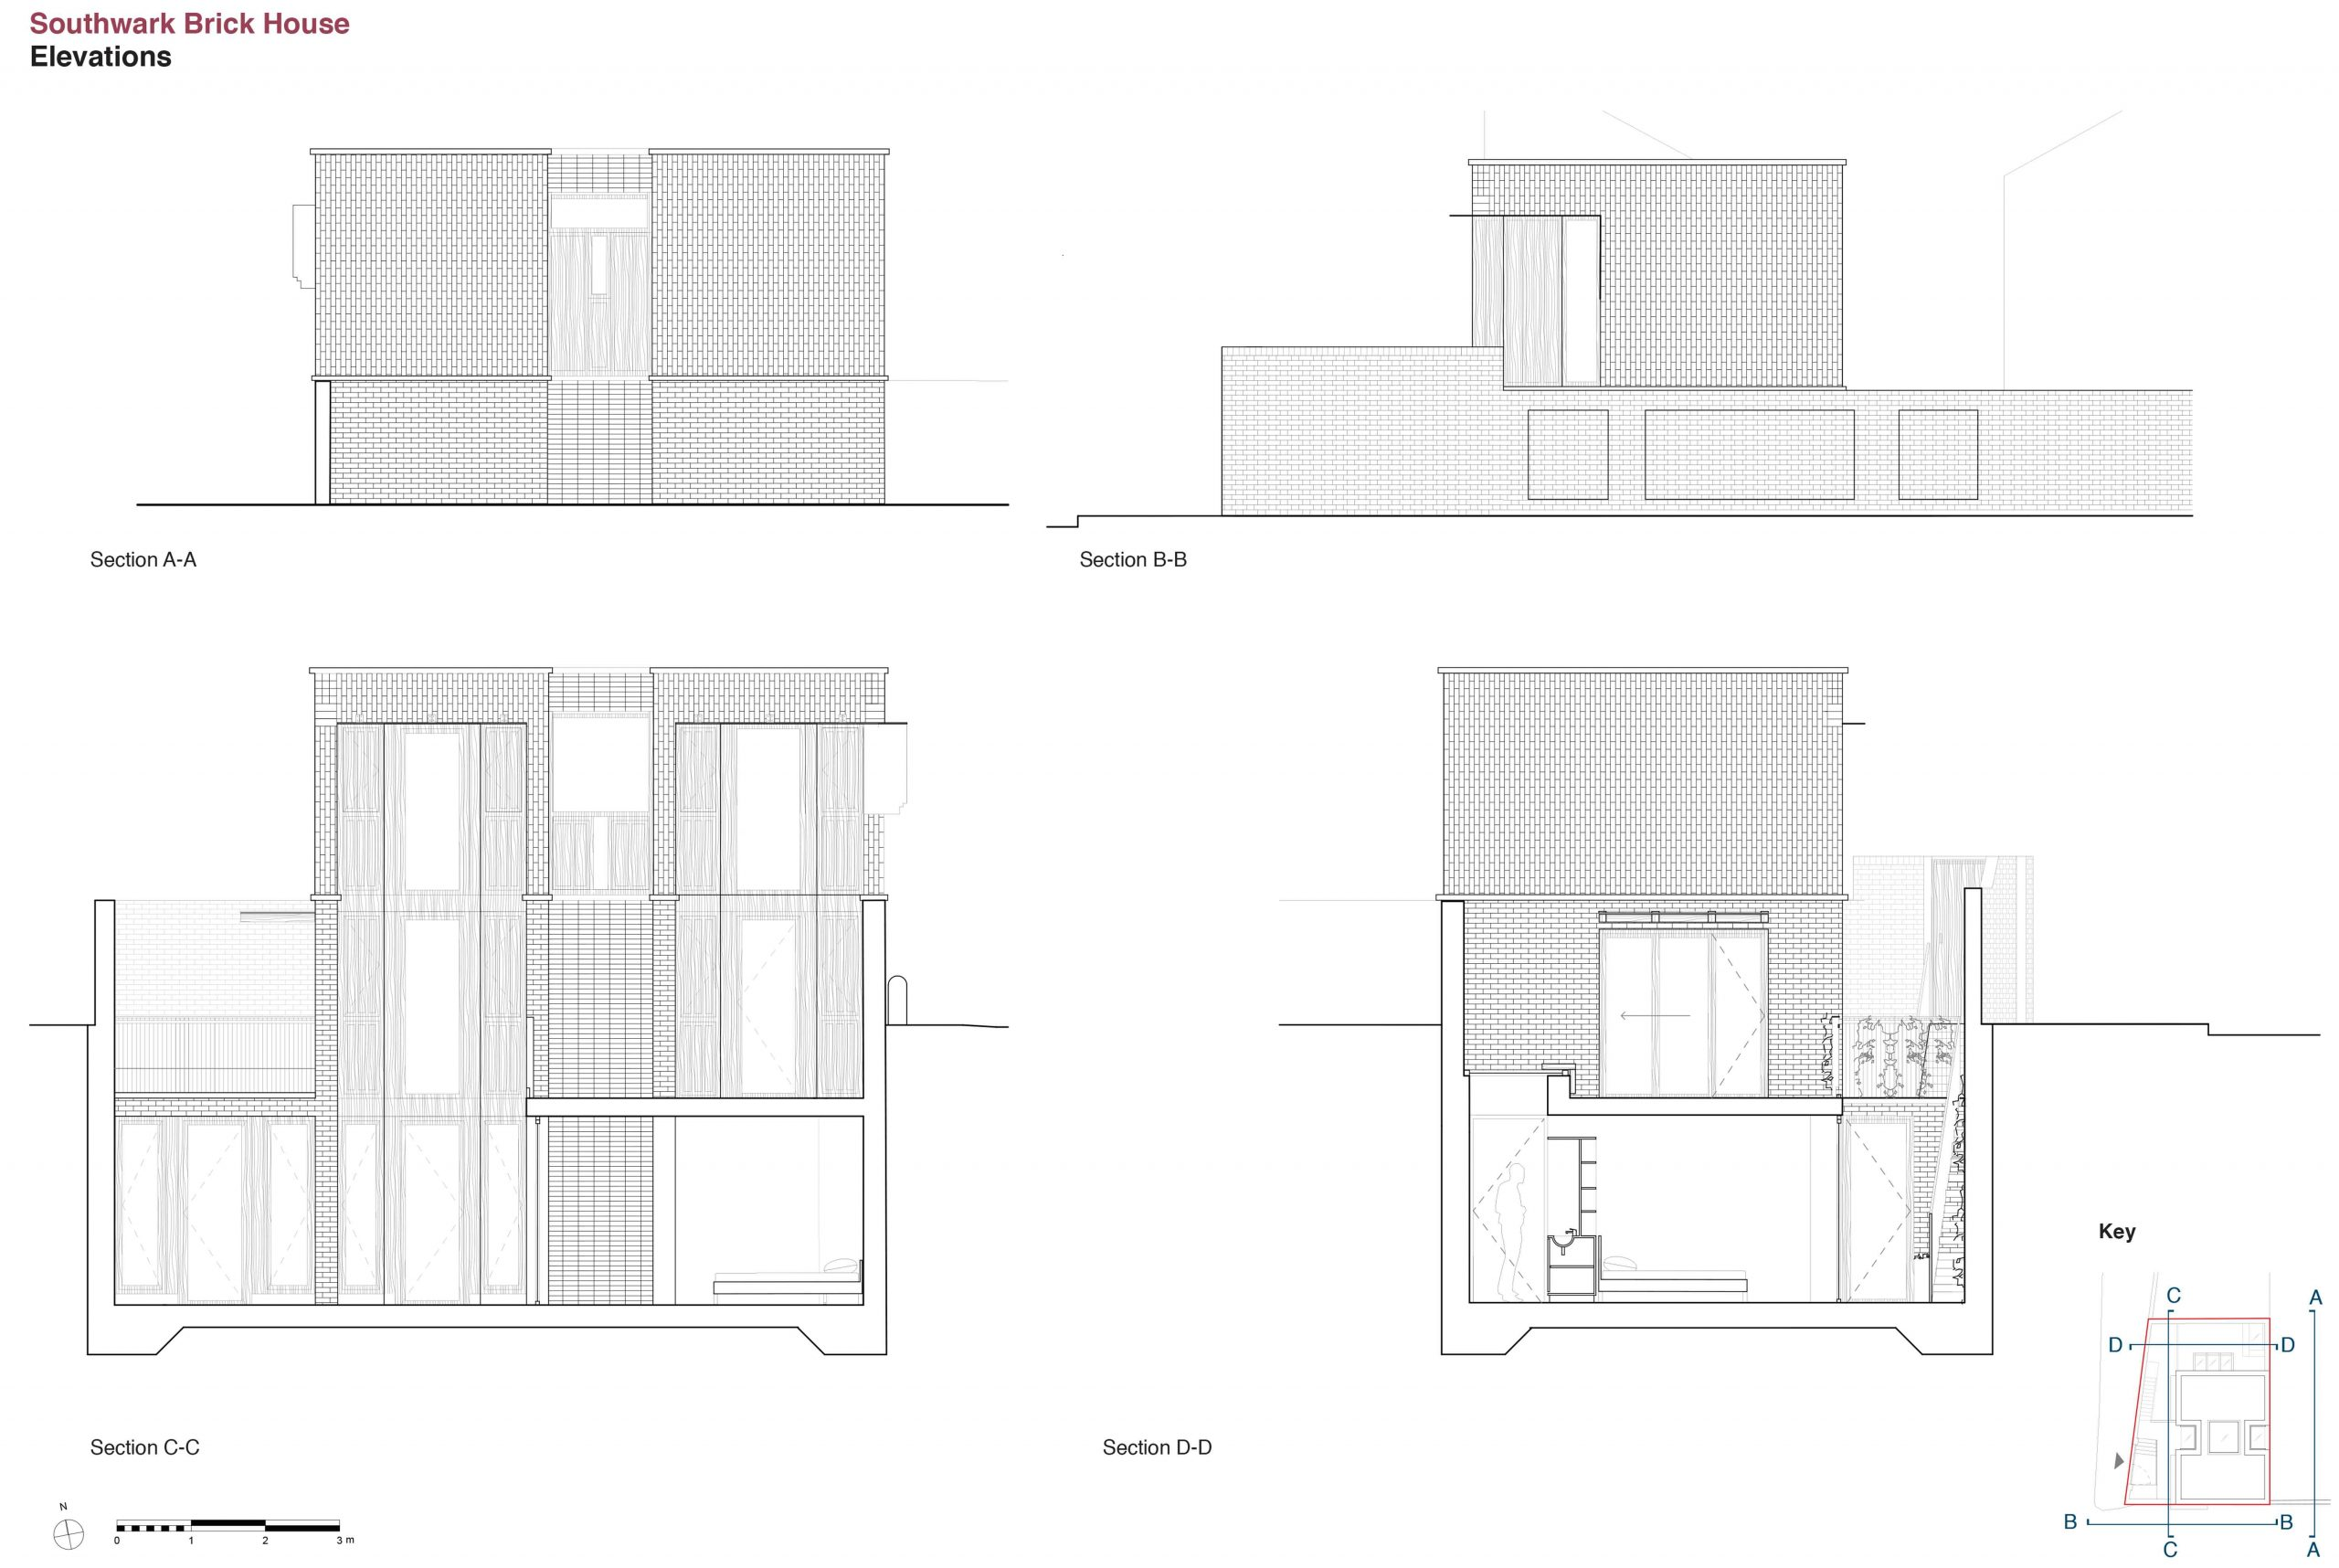 3 Southwark Brick House elevations